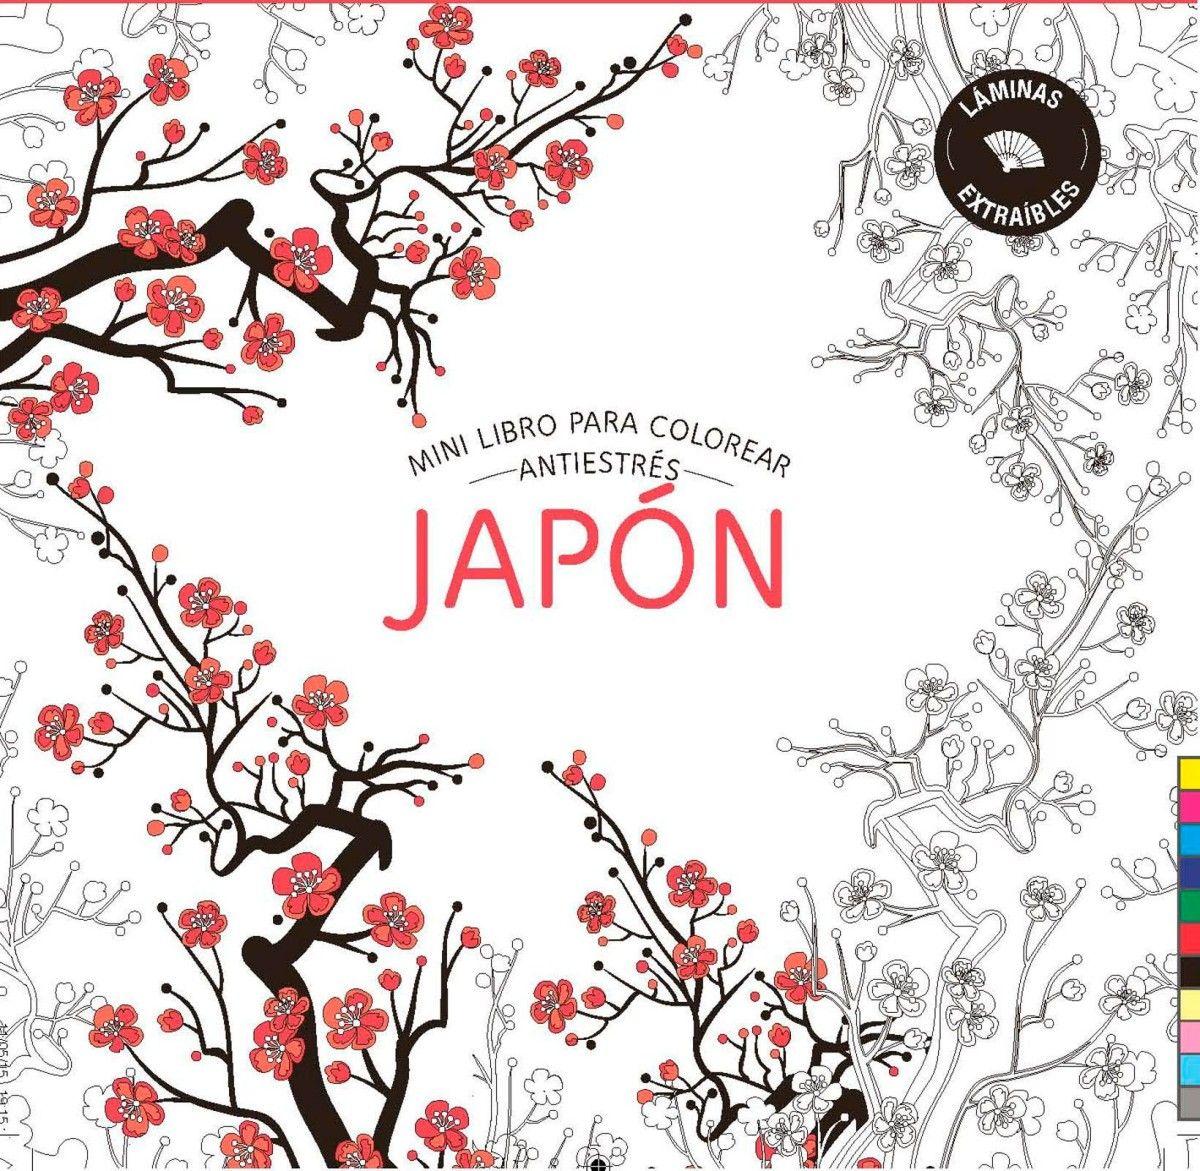 Mini libro para colorear, Japón - TELVA.COM | Pinterest